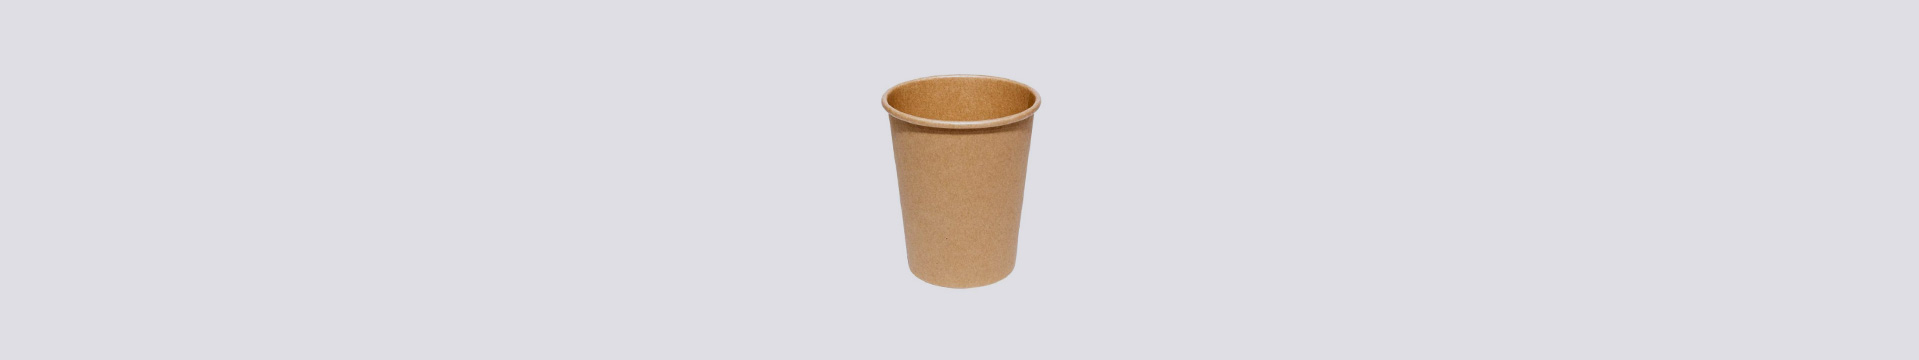 Embalagens de Eco-friendly